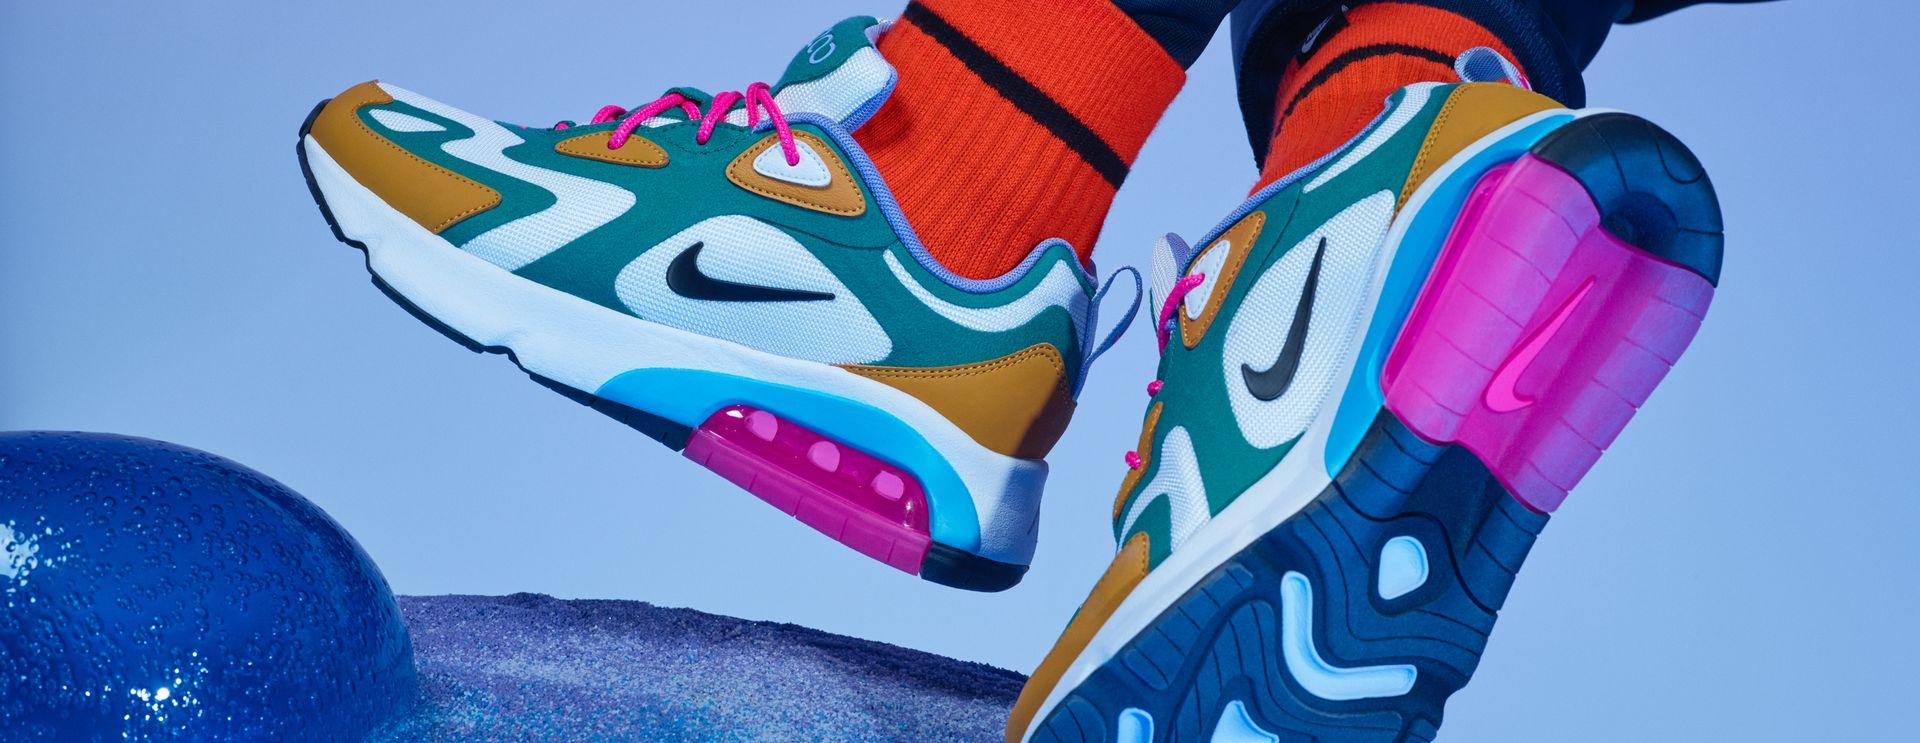 cc531491e Επίσημος ιστότοπος Nike. Nike.com GR